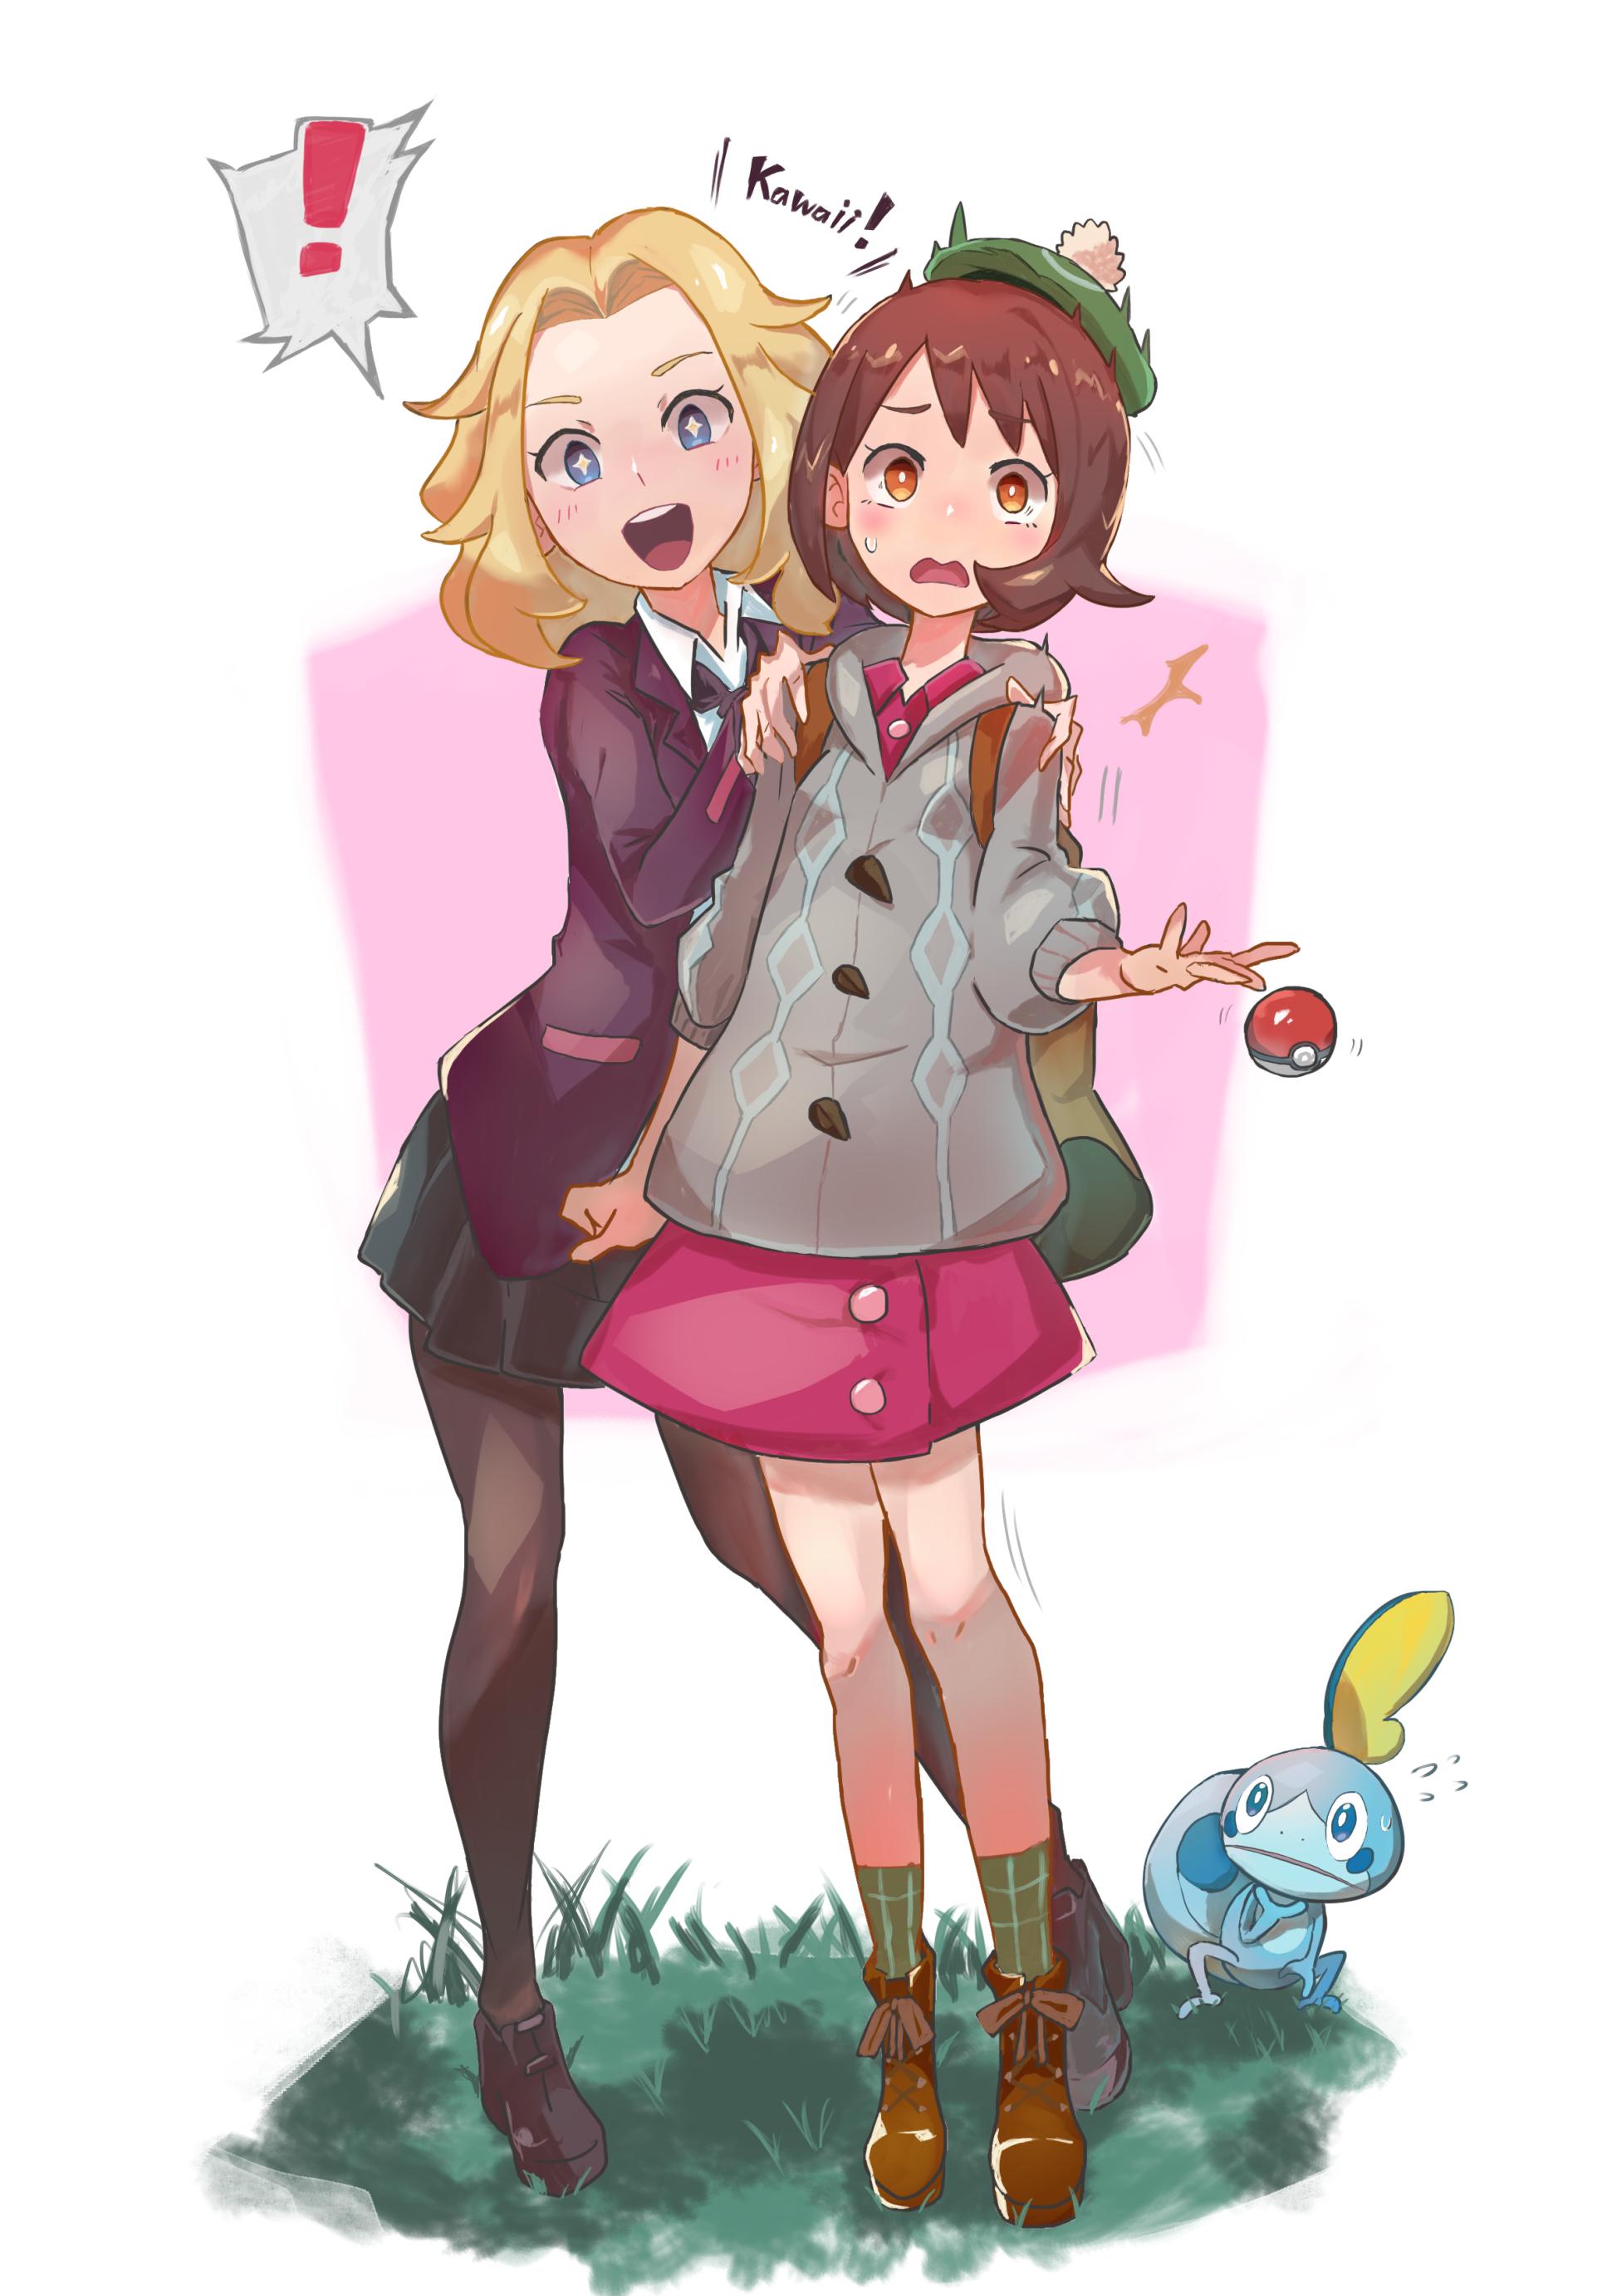 Pokemon Sword Shield Image 2508117 Zerochan Anime Image Board